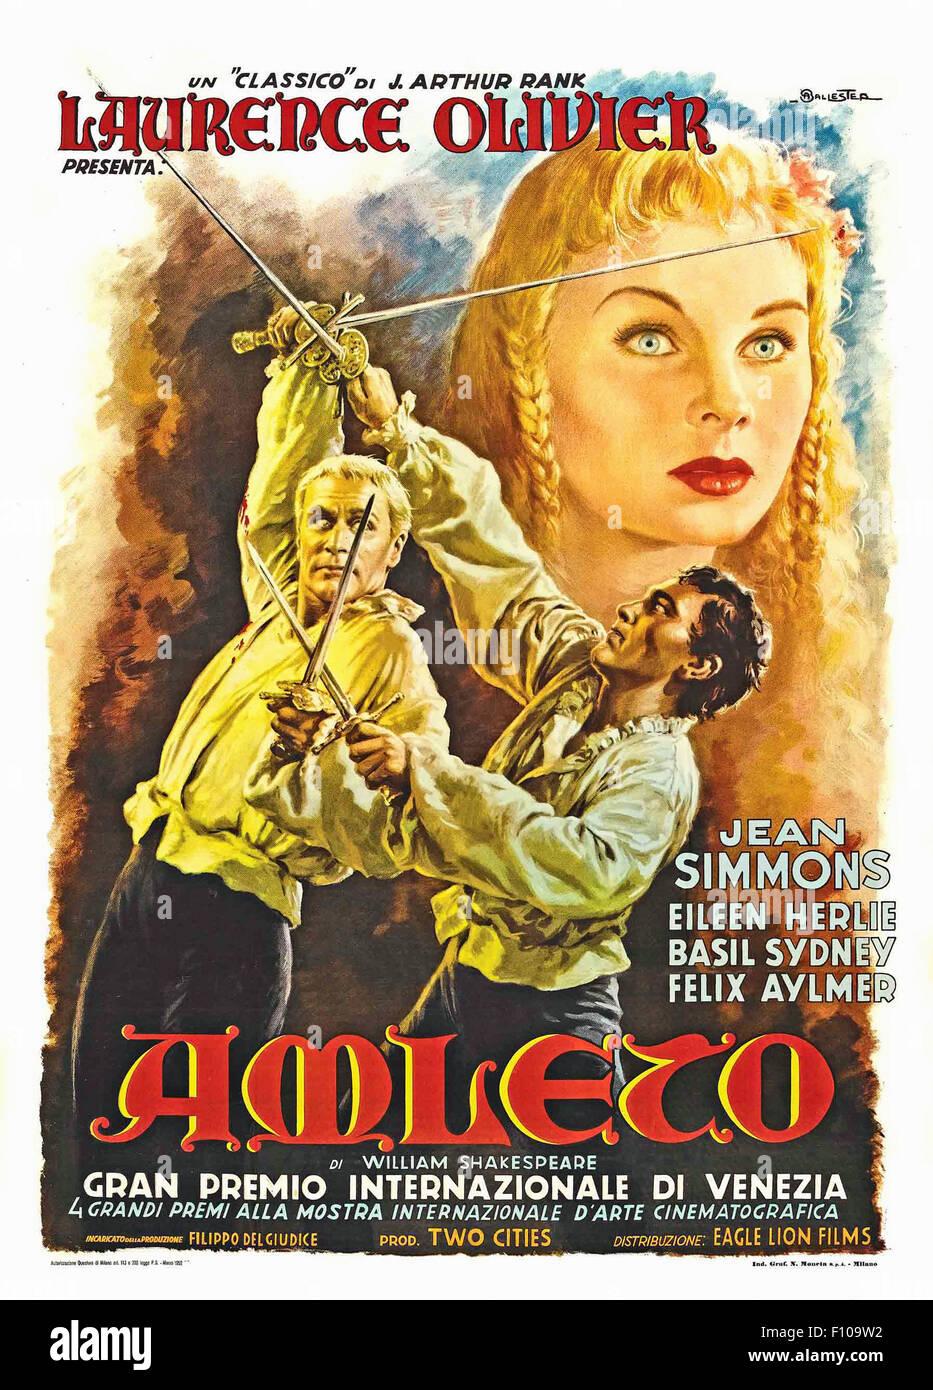 Hamlet (1948) - Italian Movie Poster - Stock Image